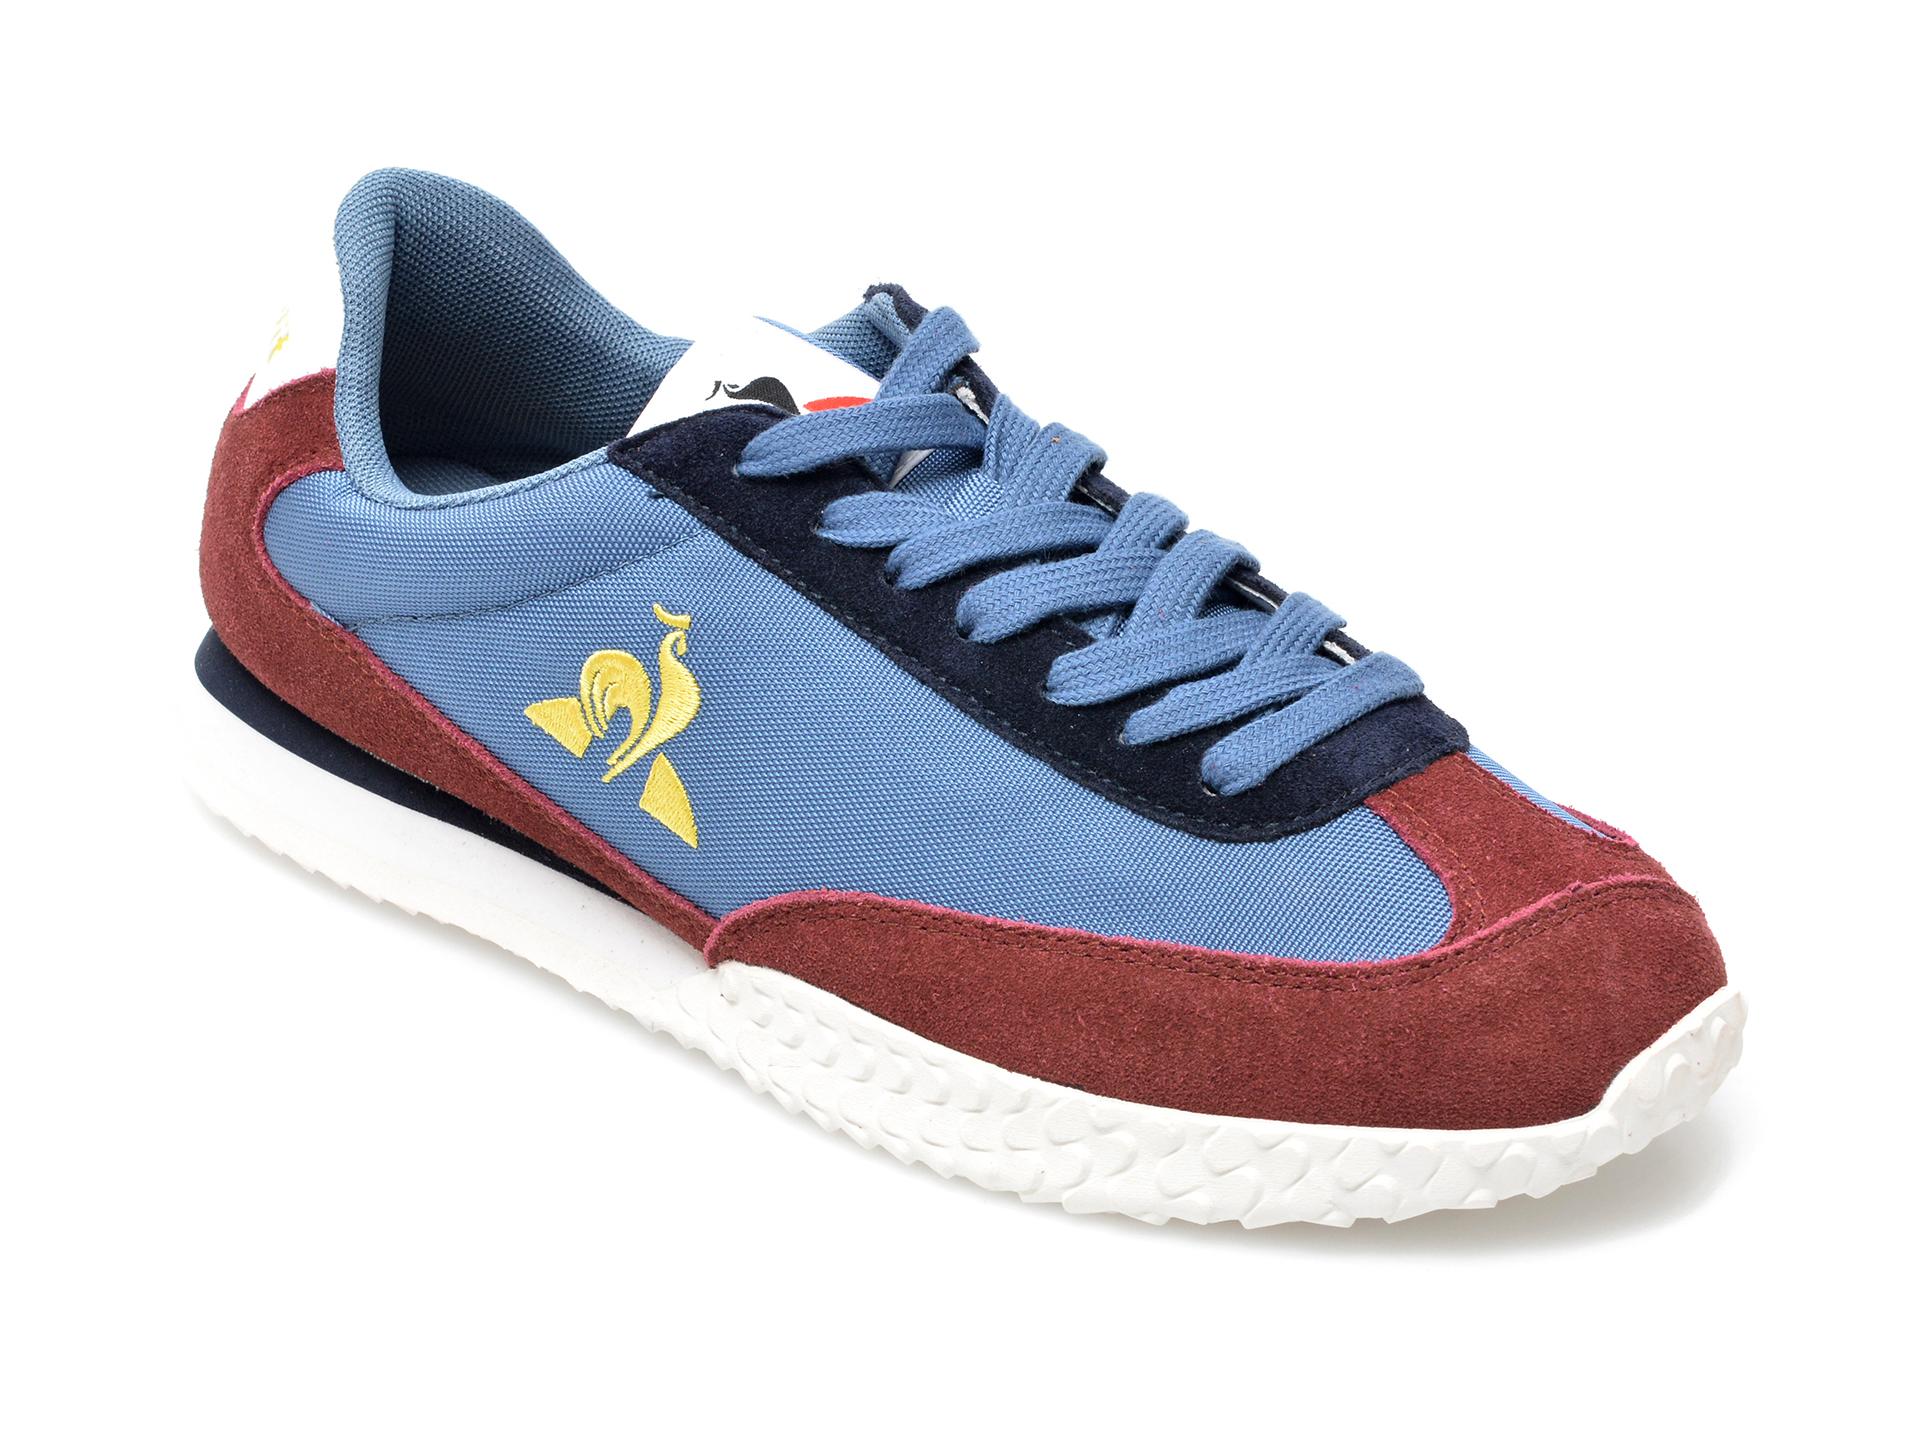 Pantofi Sport Le Coq Sportif Albastri, Veloce, Din Material Textil Si Piele Intoarsa